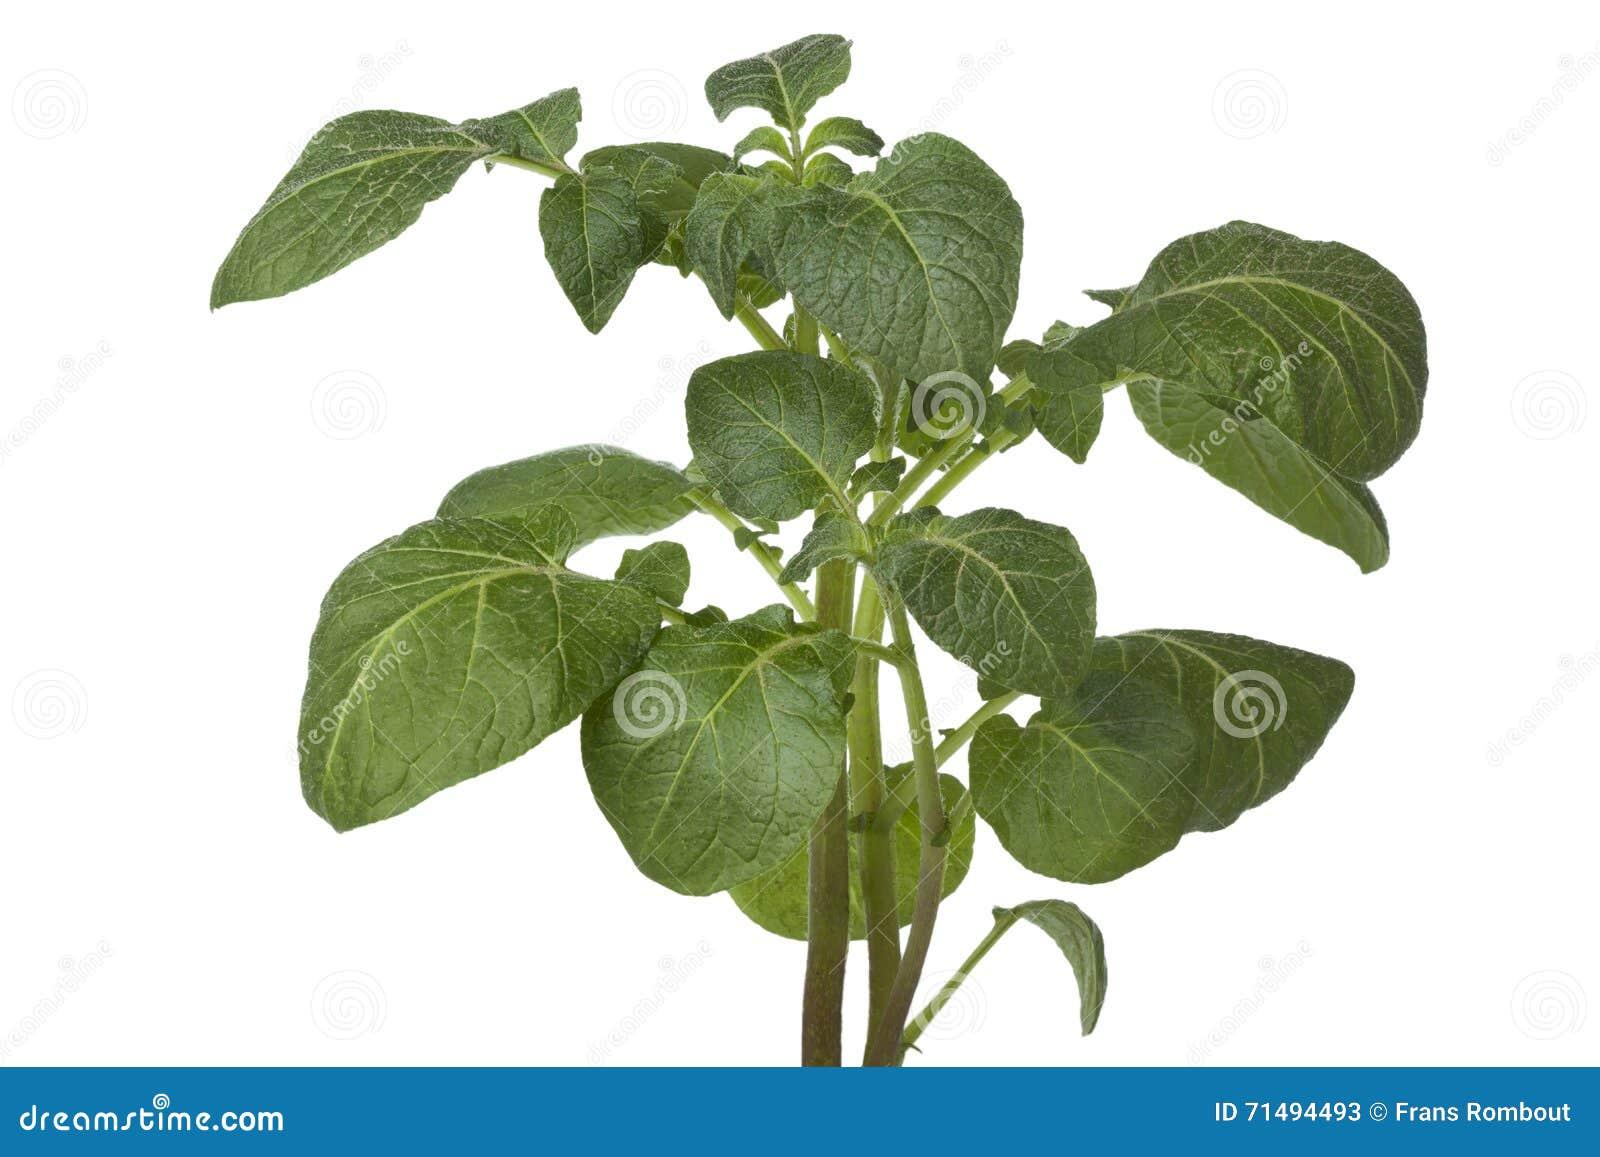 Download Fresh green potato plant stock image. Image of white - 71494493